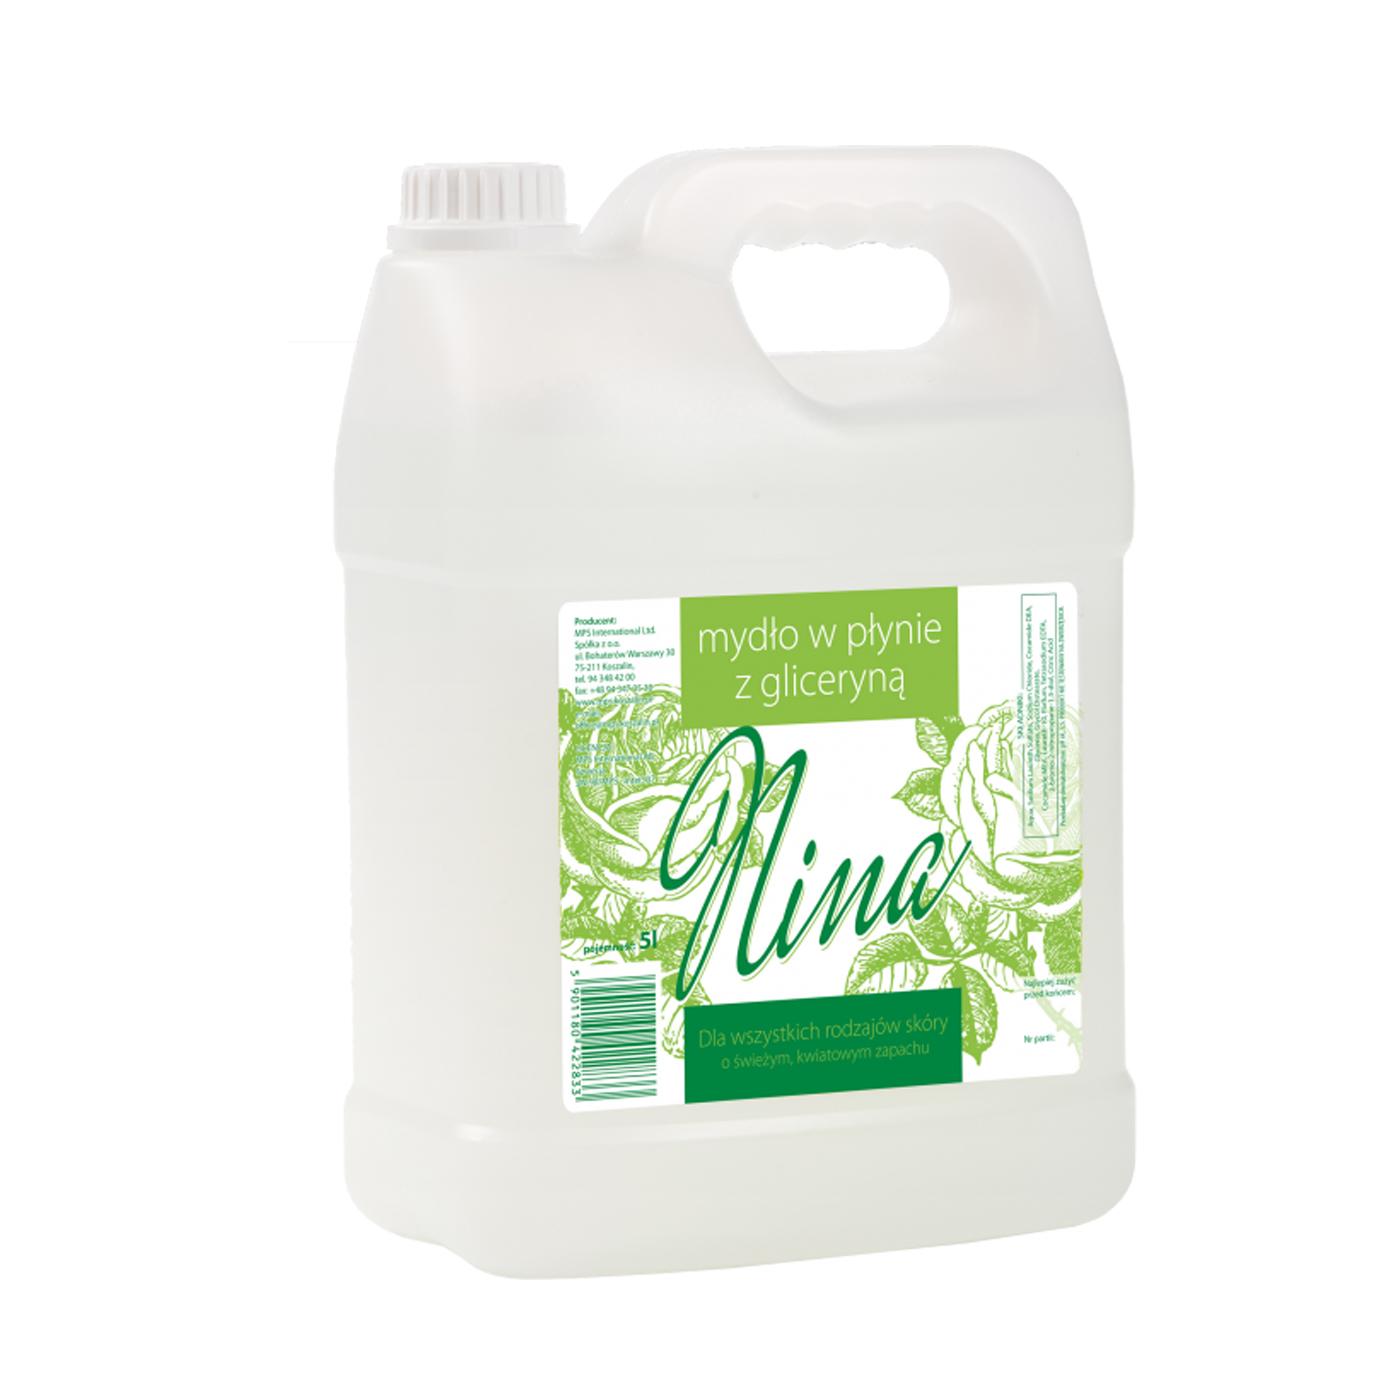 Mydło do mycia skóry Nina z gliceryną MPS